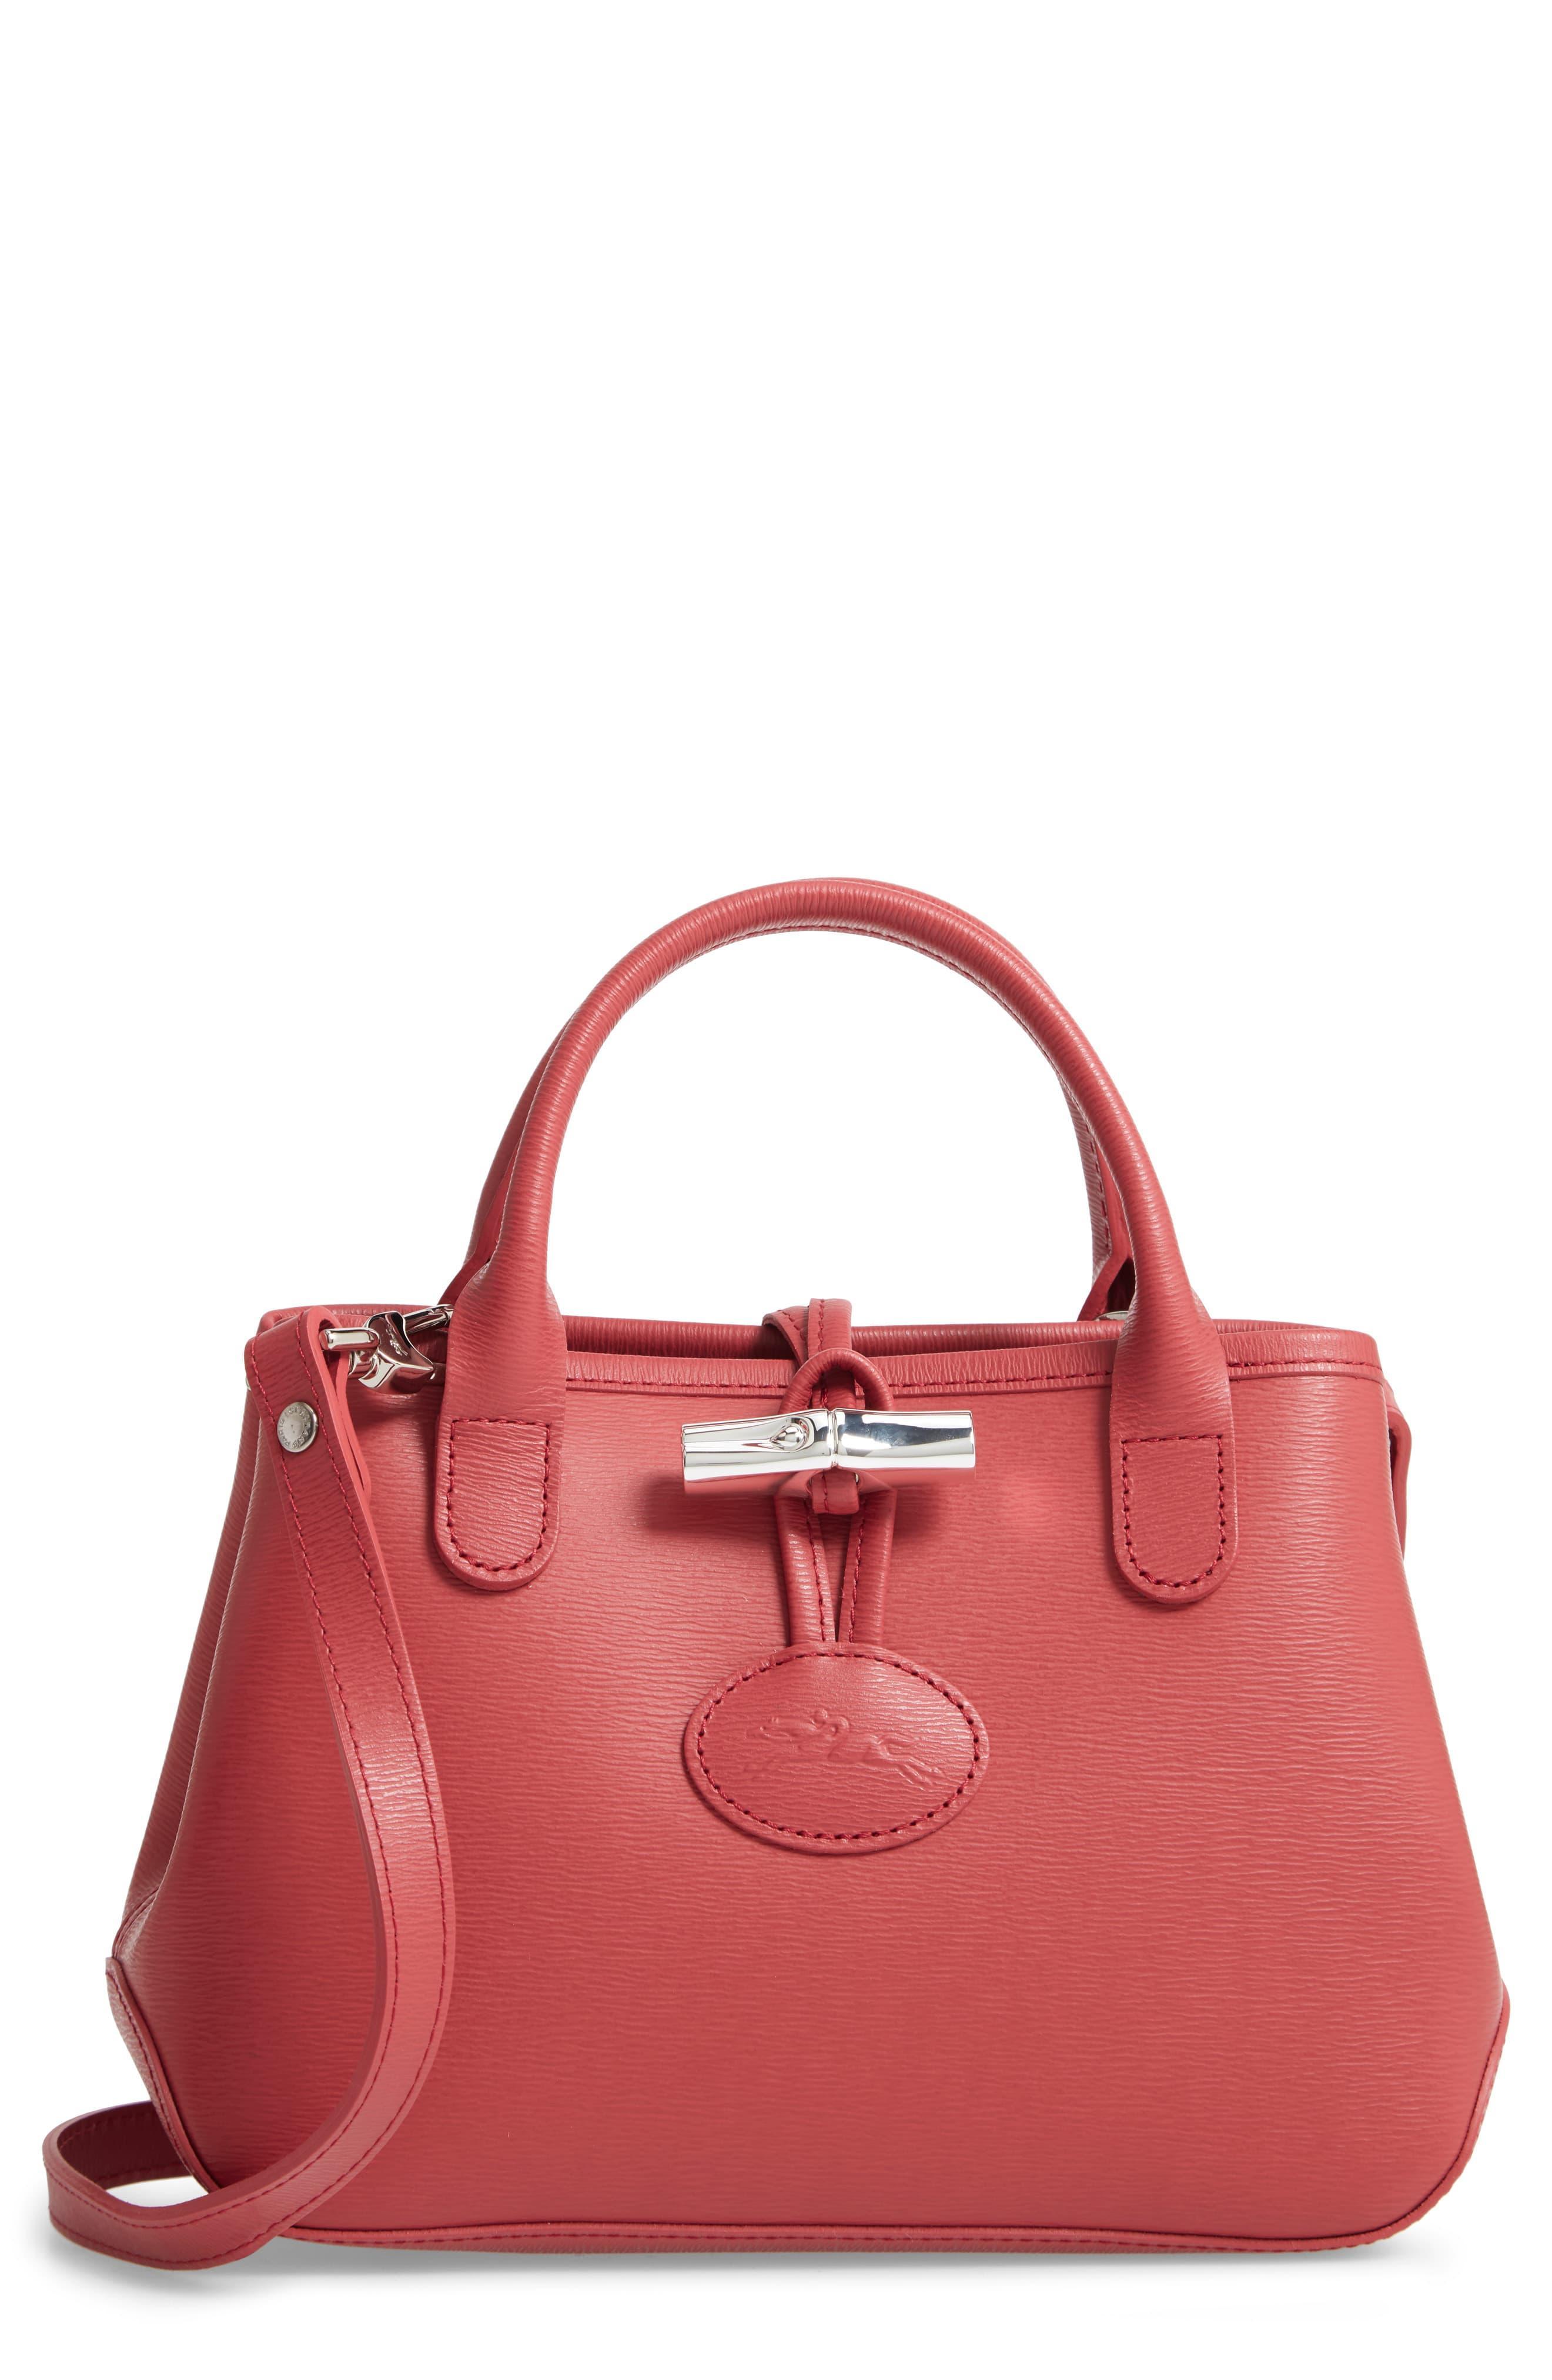 7baad433a Longchamp - Multicolor Mini Roseau Leather Crossbody Bag - Lyst. View  fullscreen